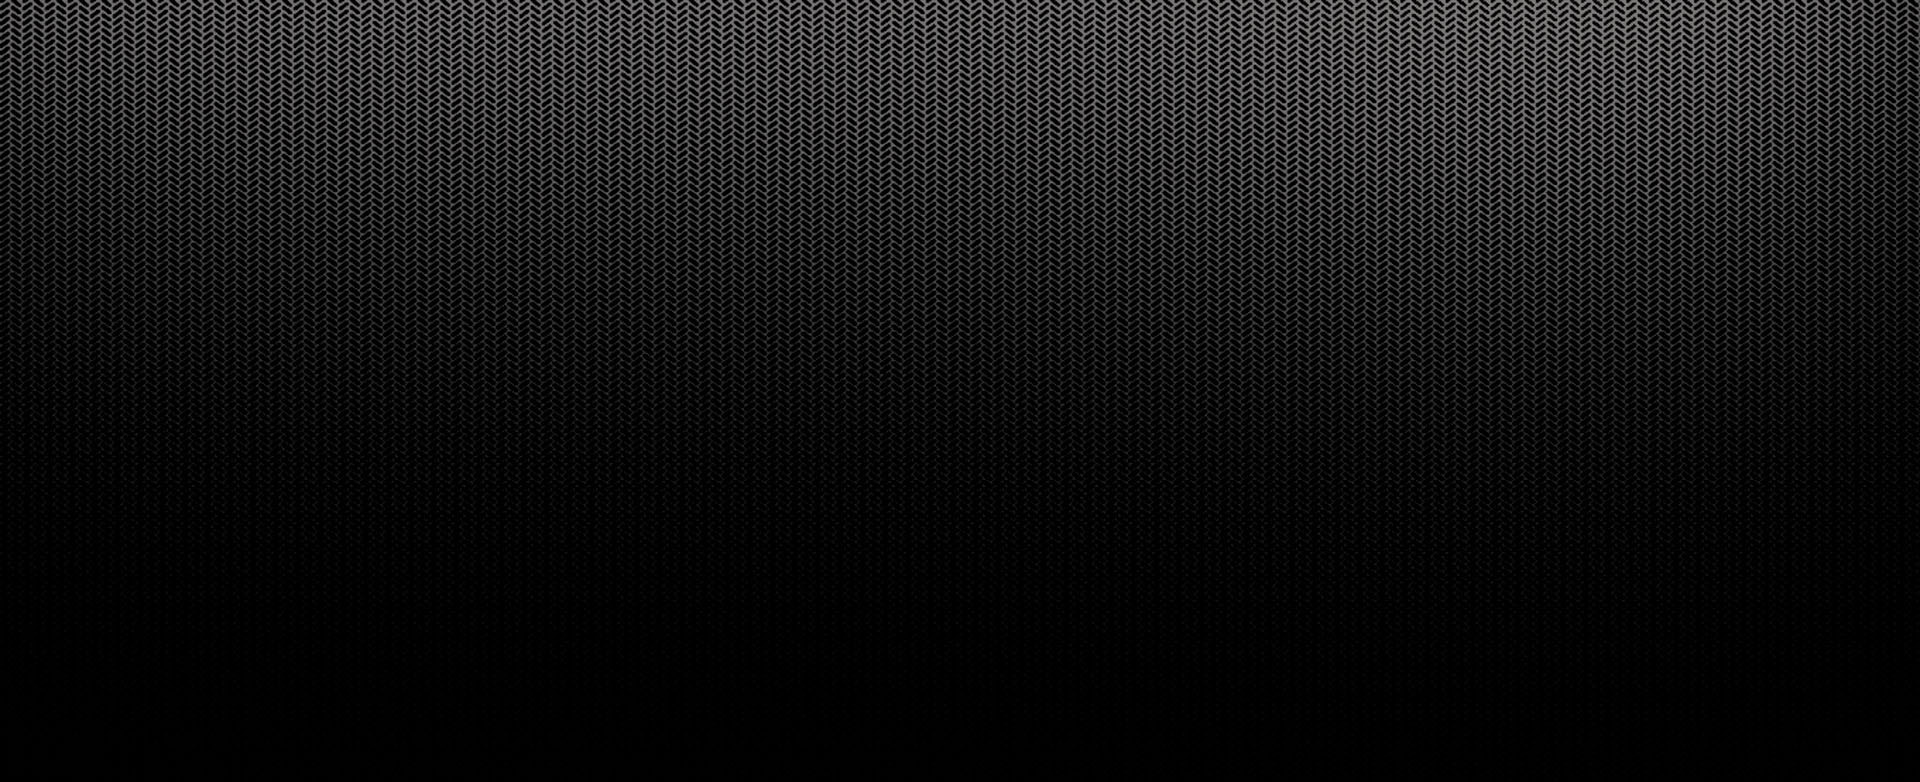 Black Backgrounds 18 Free Hd Wallpaper